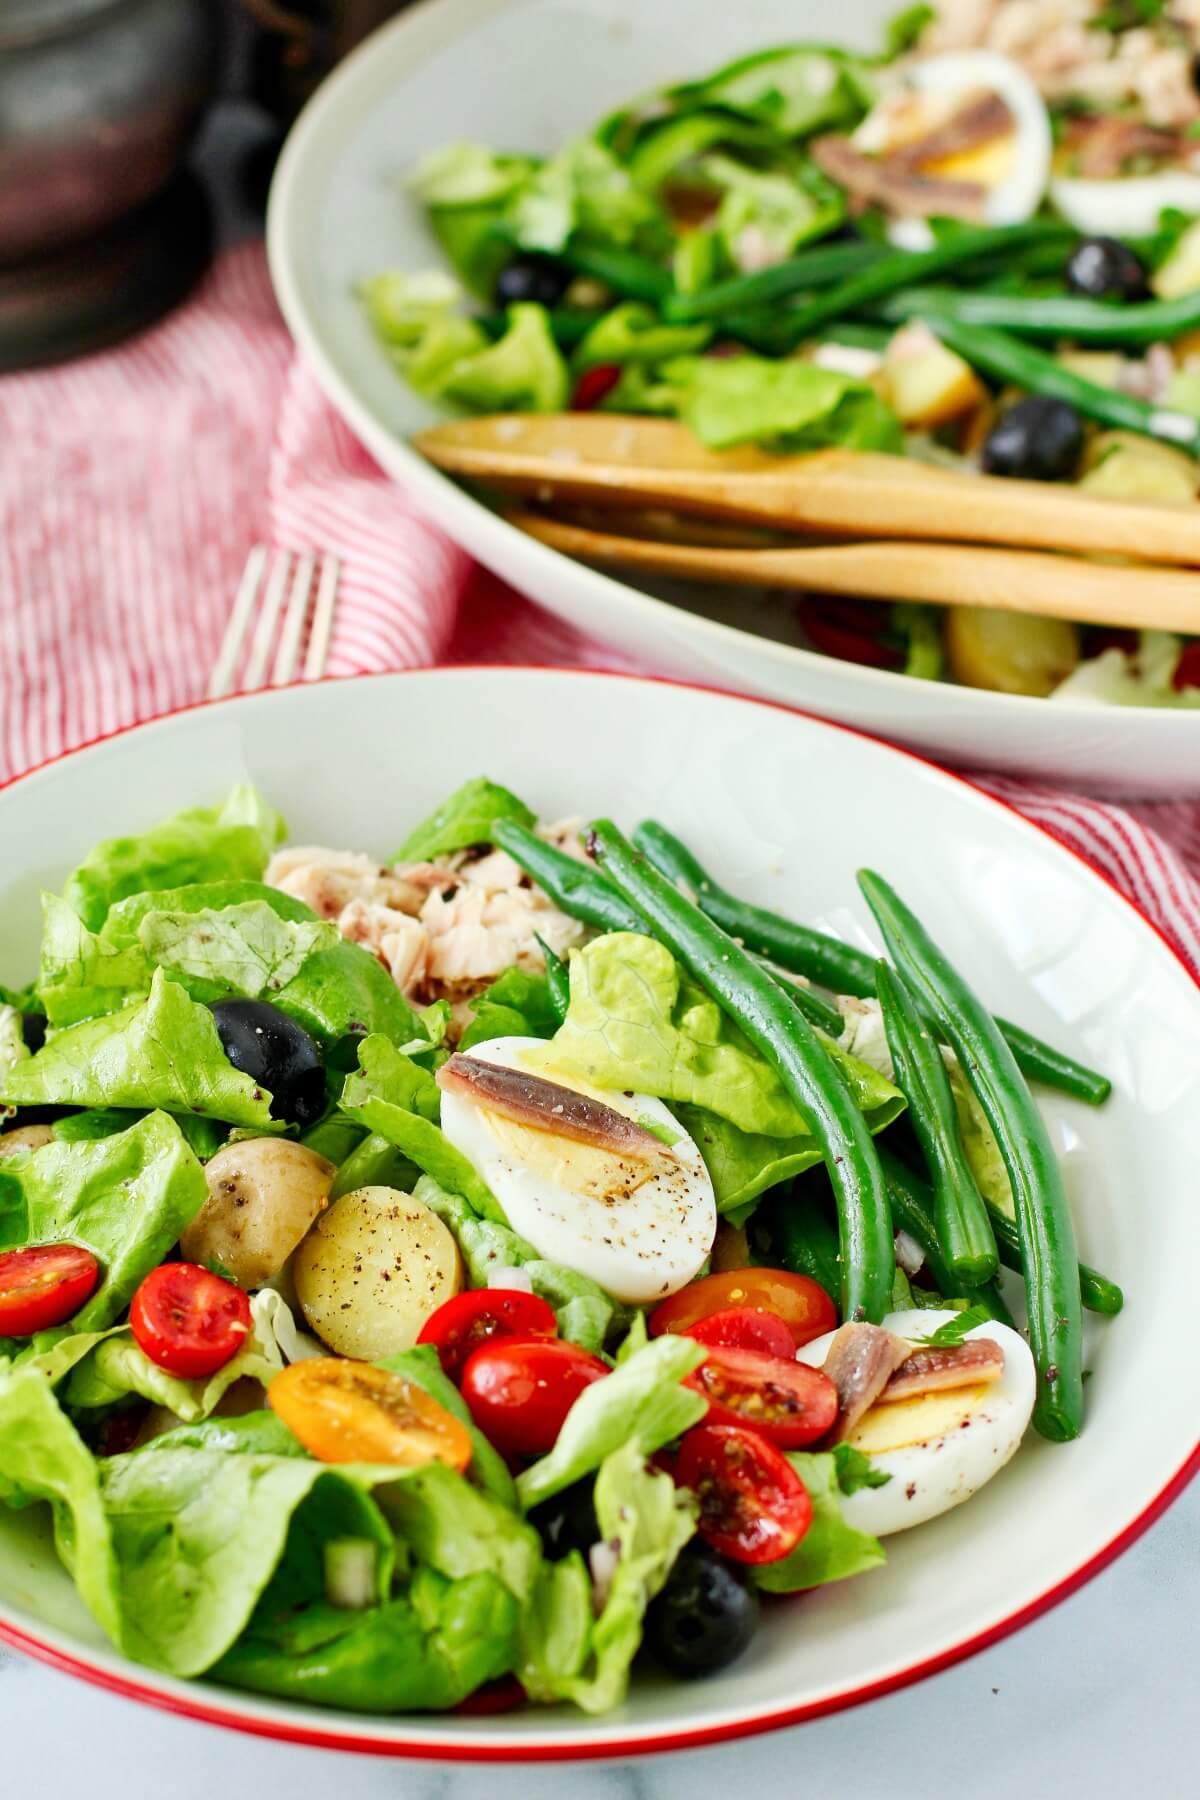 Salade Niçoise plated